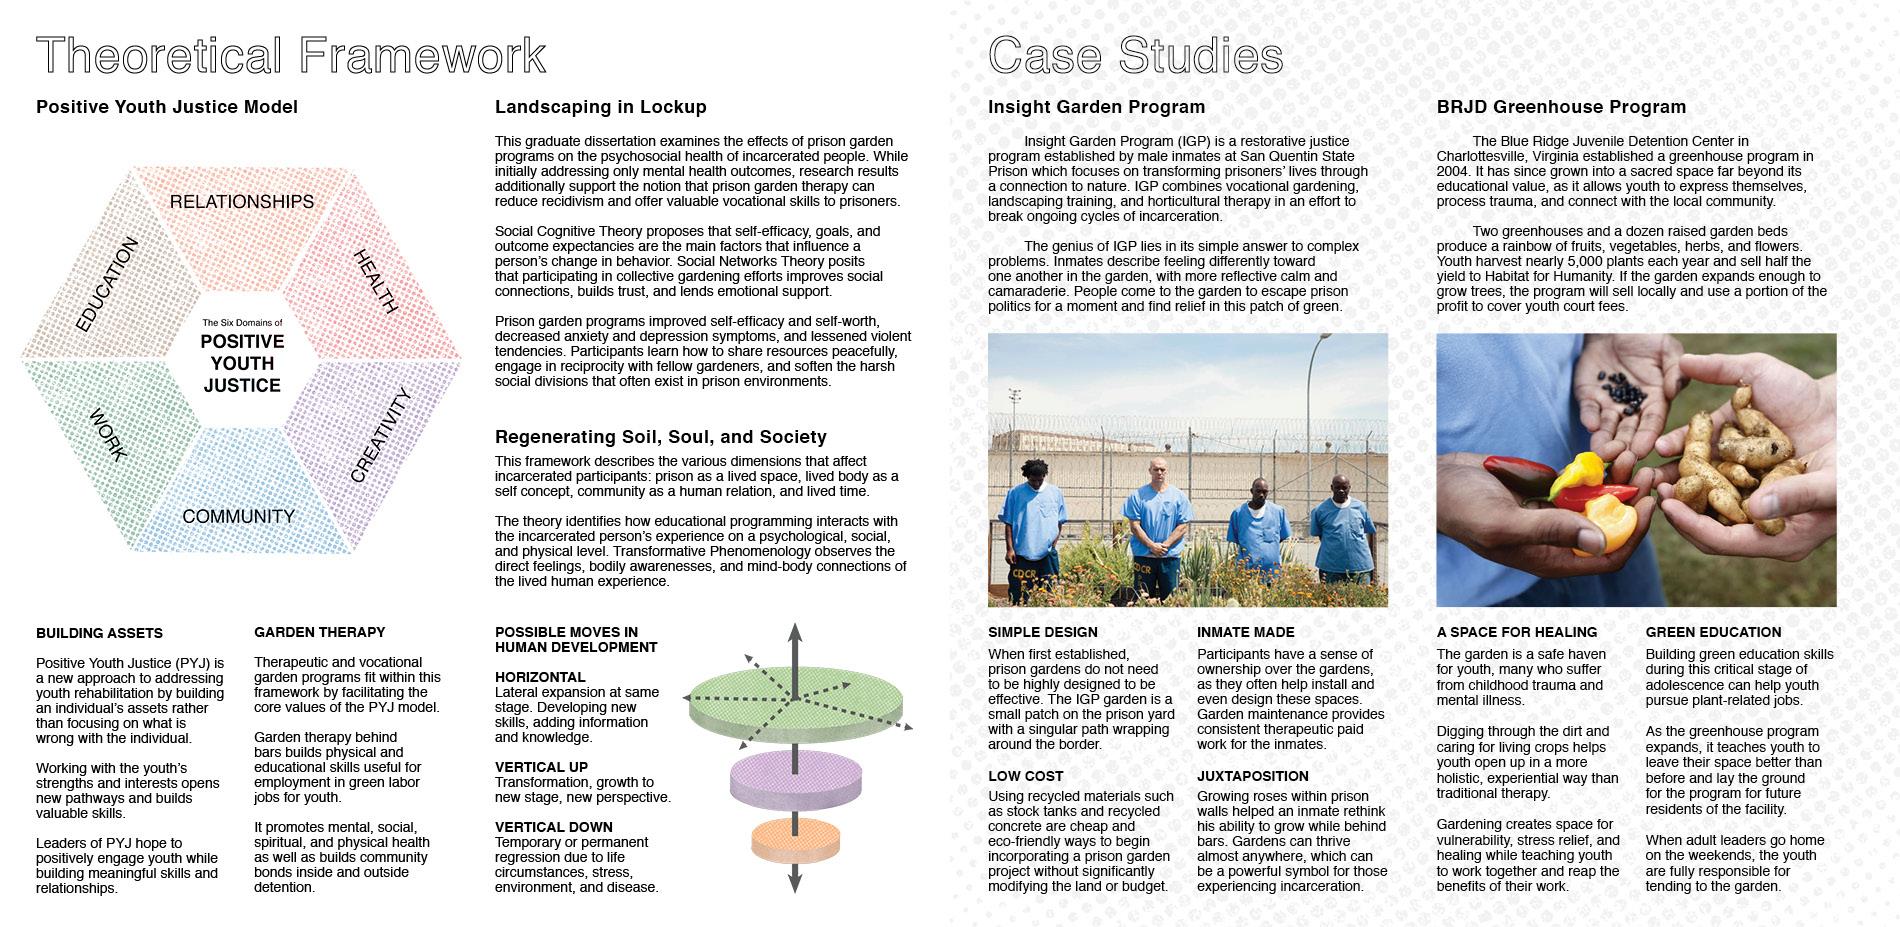 Theoretical Framework and Case Studies